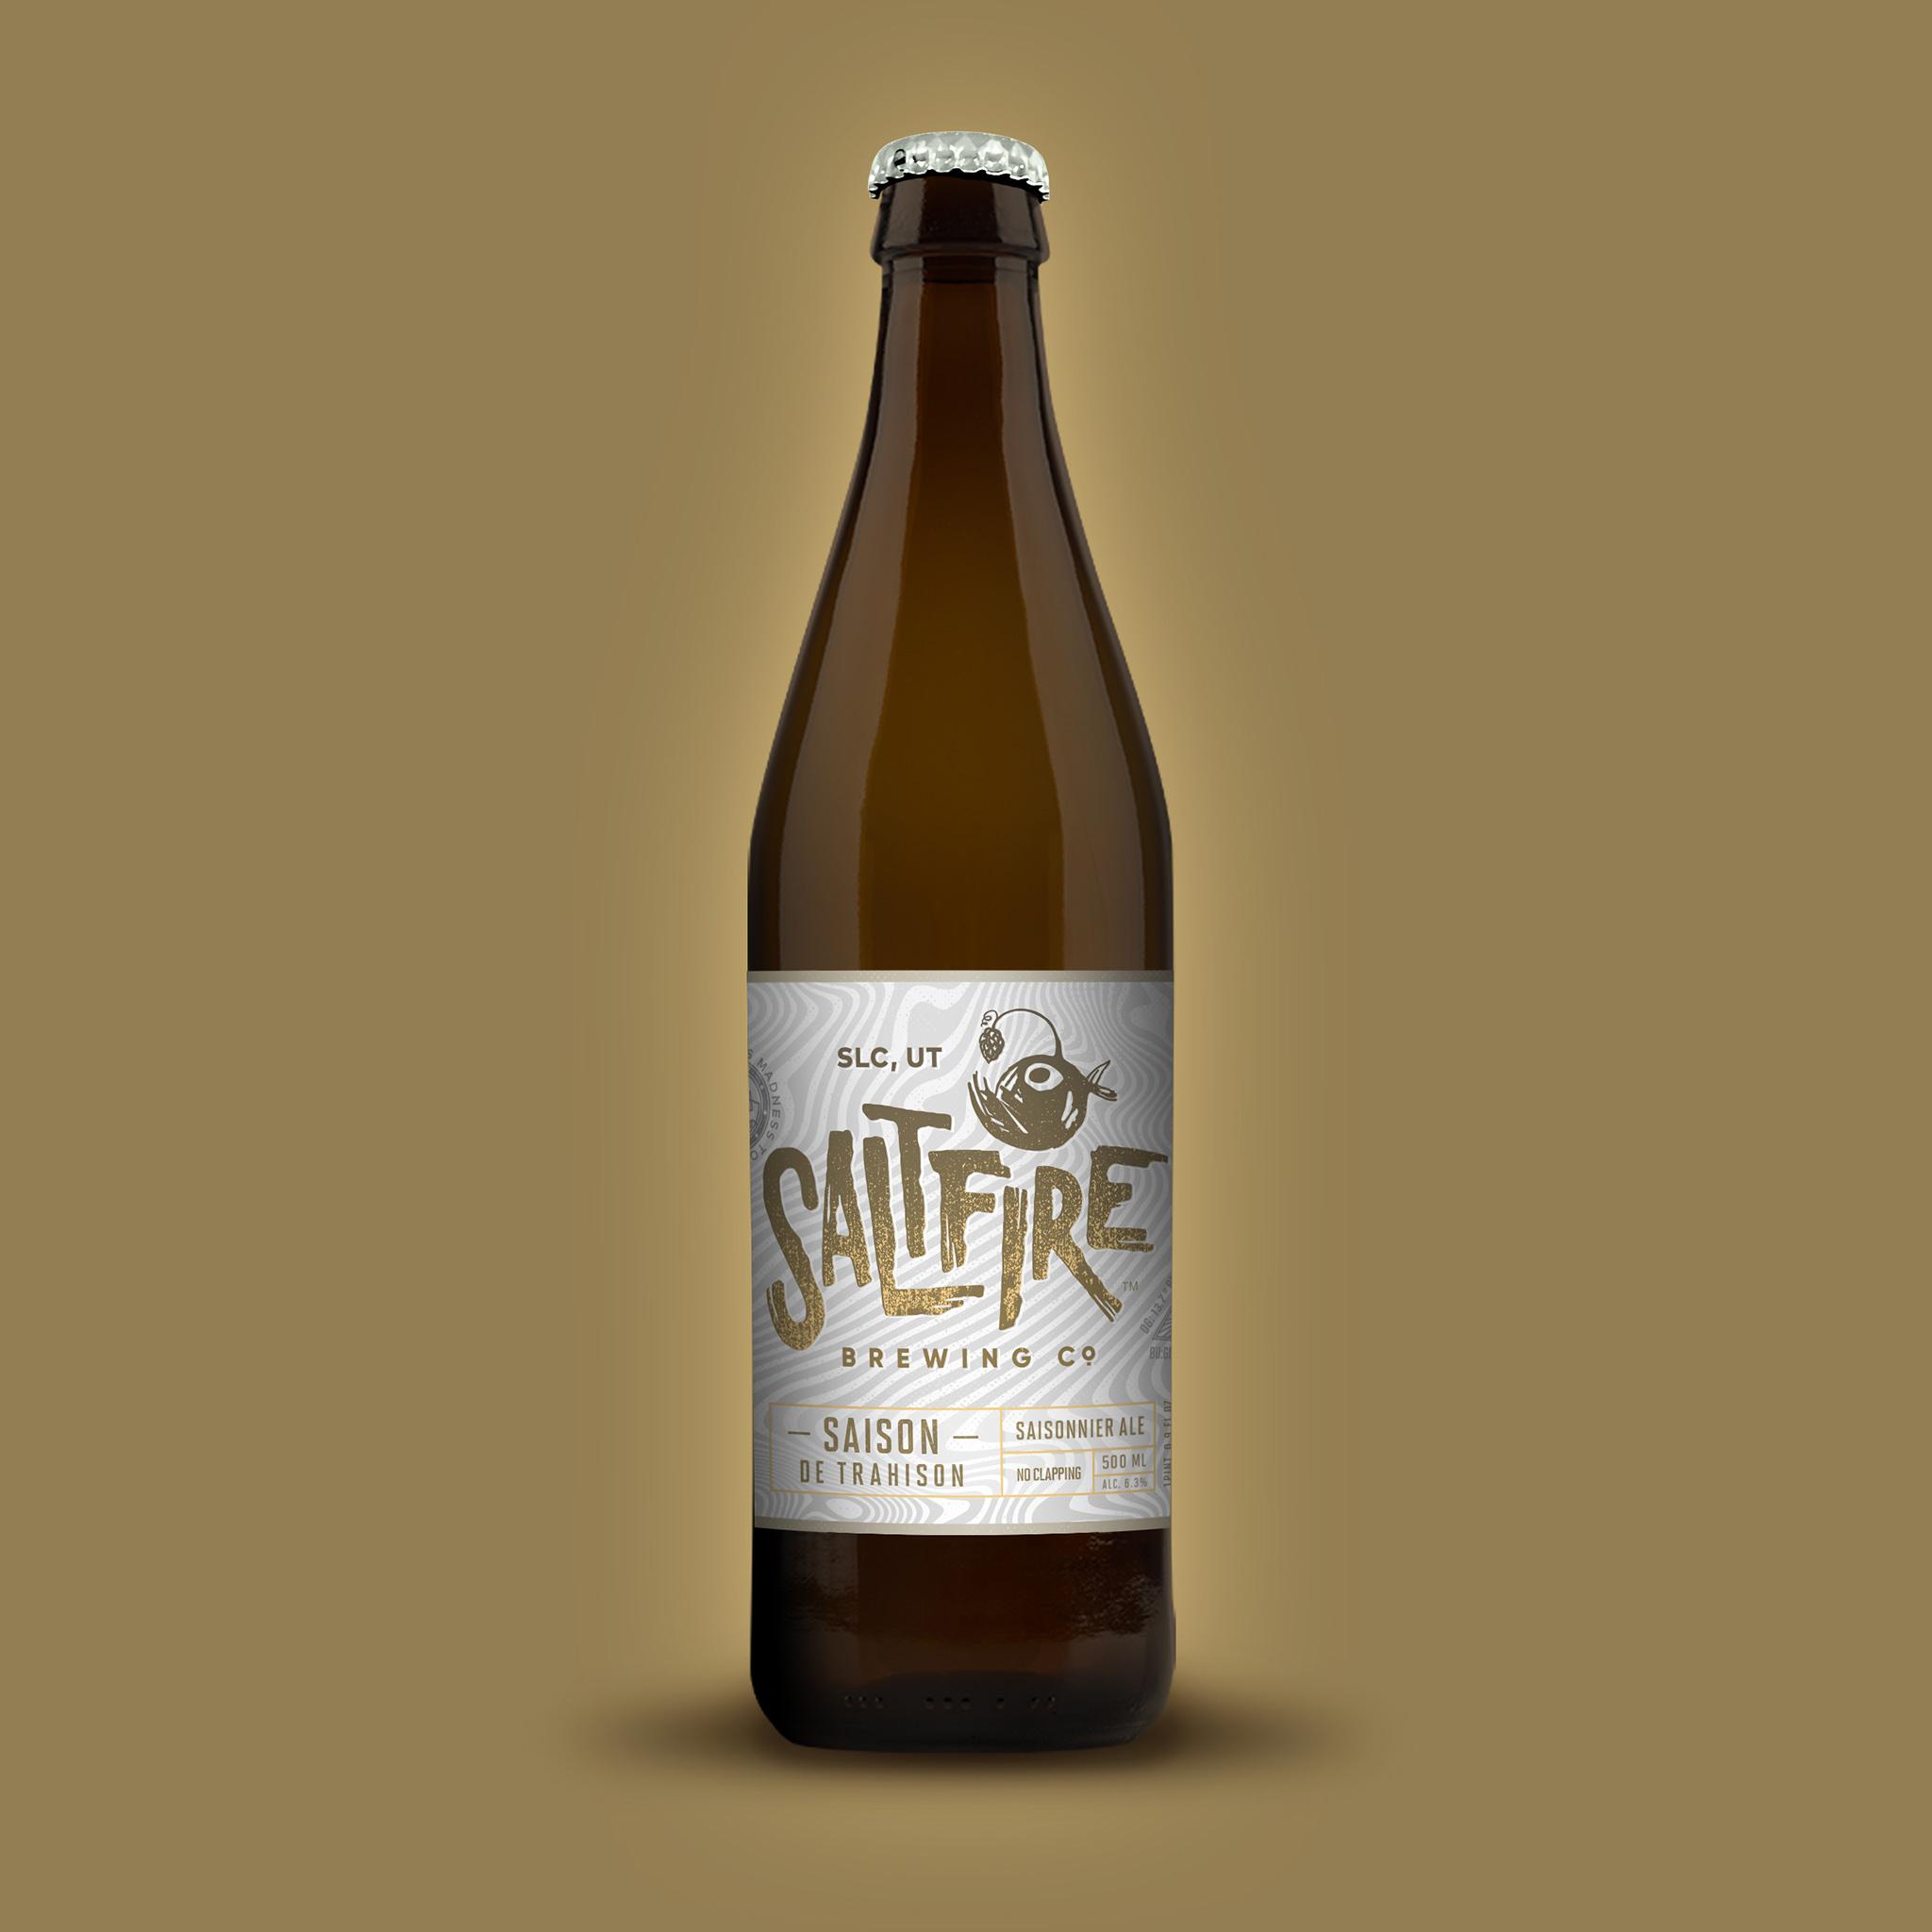 SALTFIRE-SAISON-SAISONNIER ALE-UTAH-CRAFT-BEER.jpg